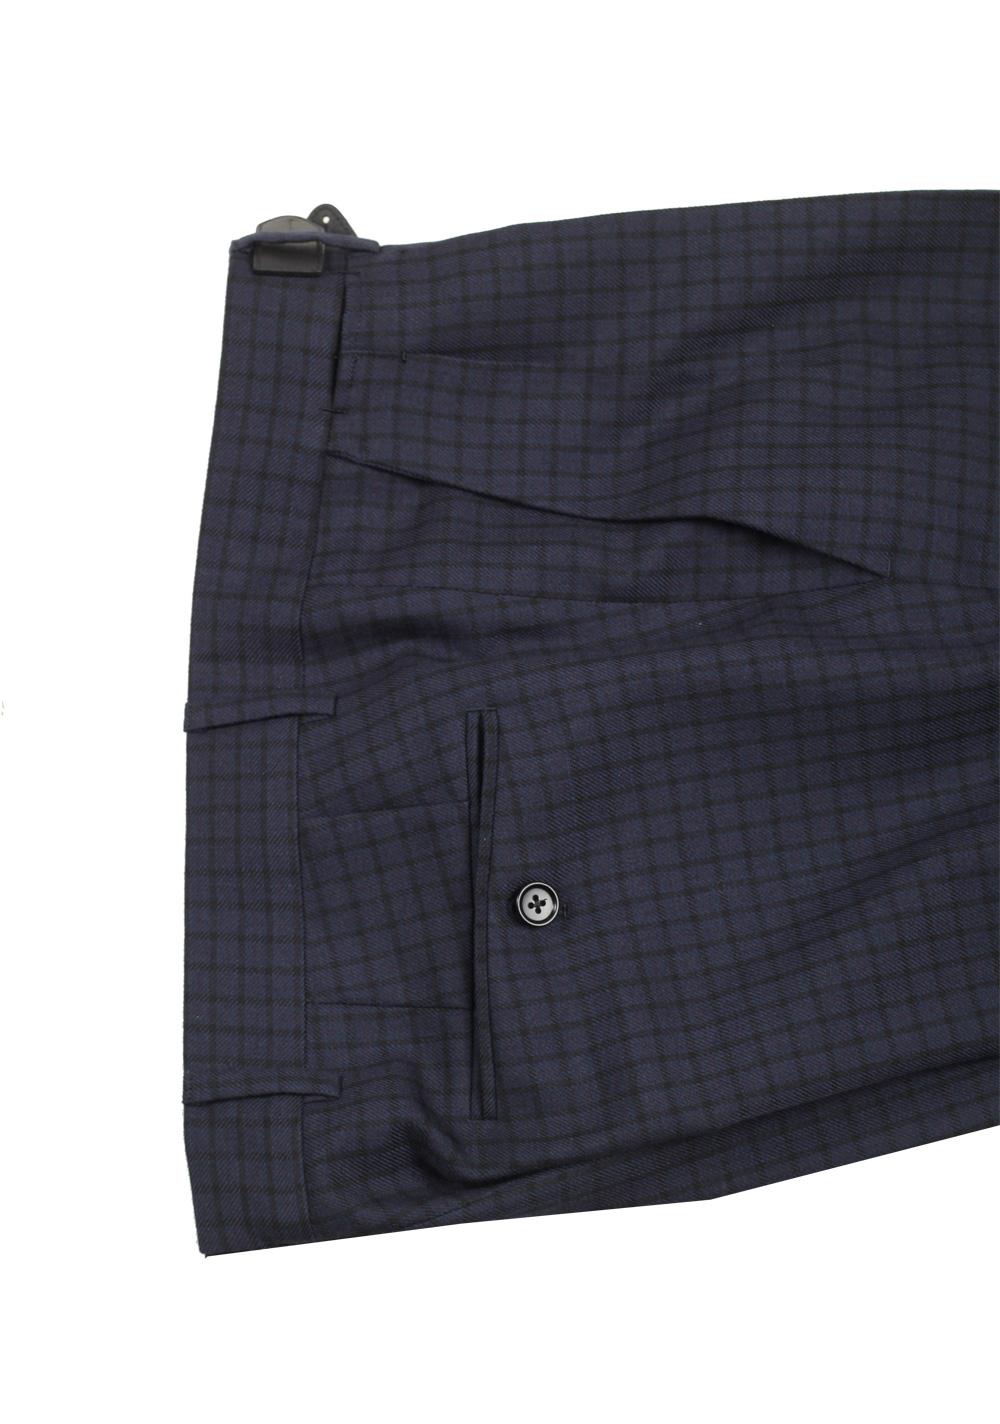 TOM FORD Atticus Blue Checked Suit Size 46 / 36R U.S. | Costume Limité